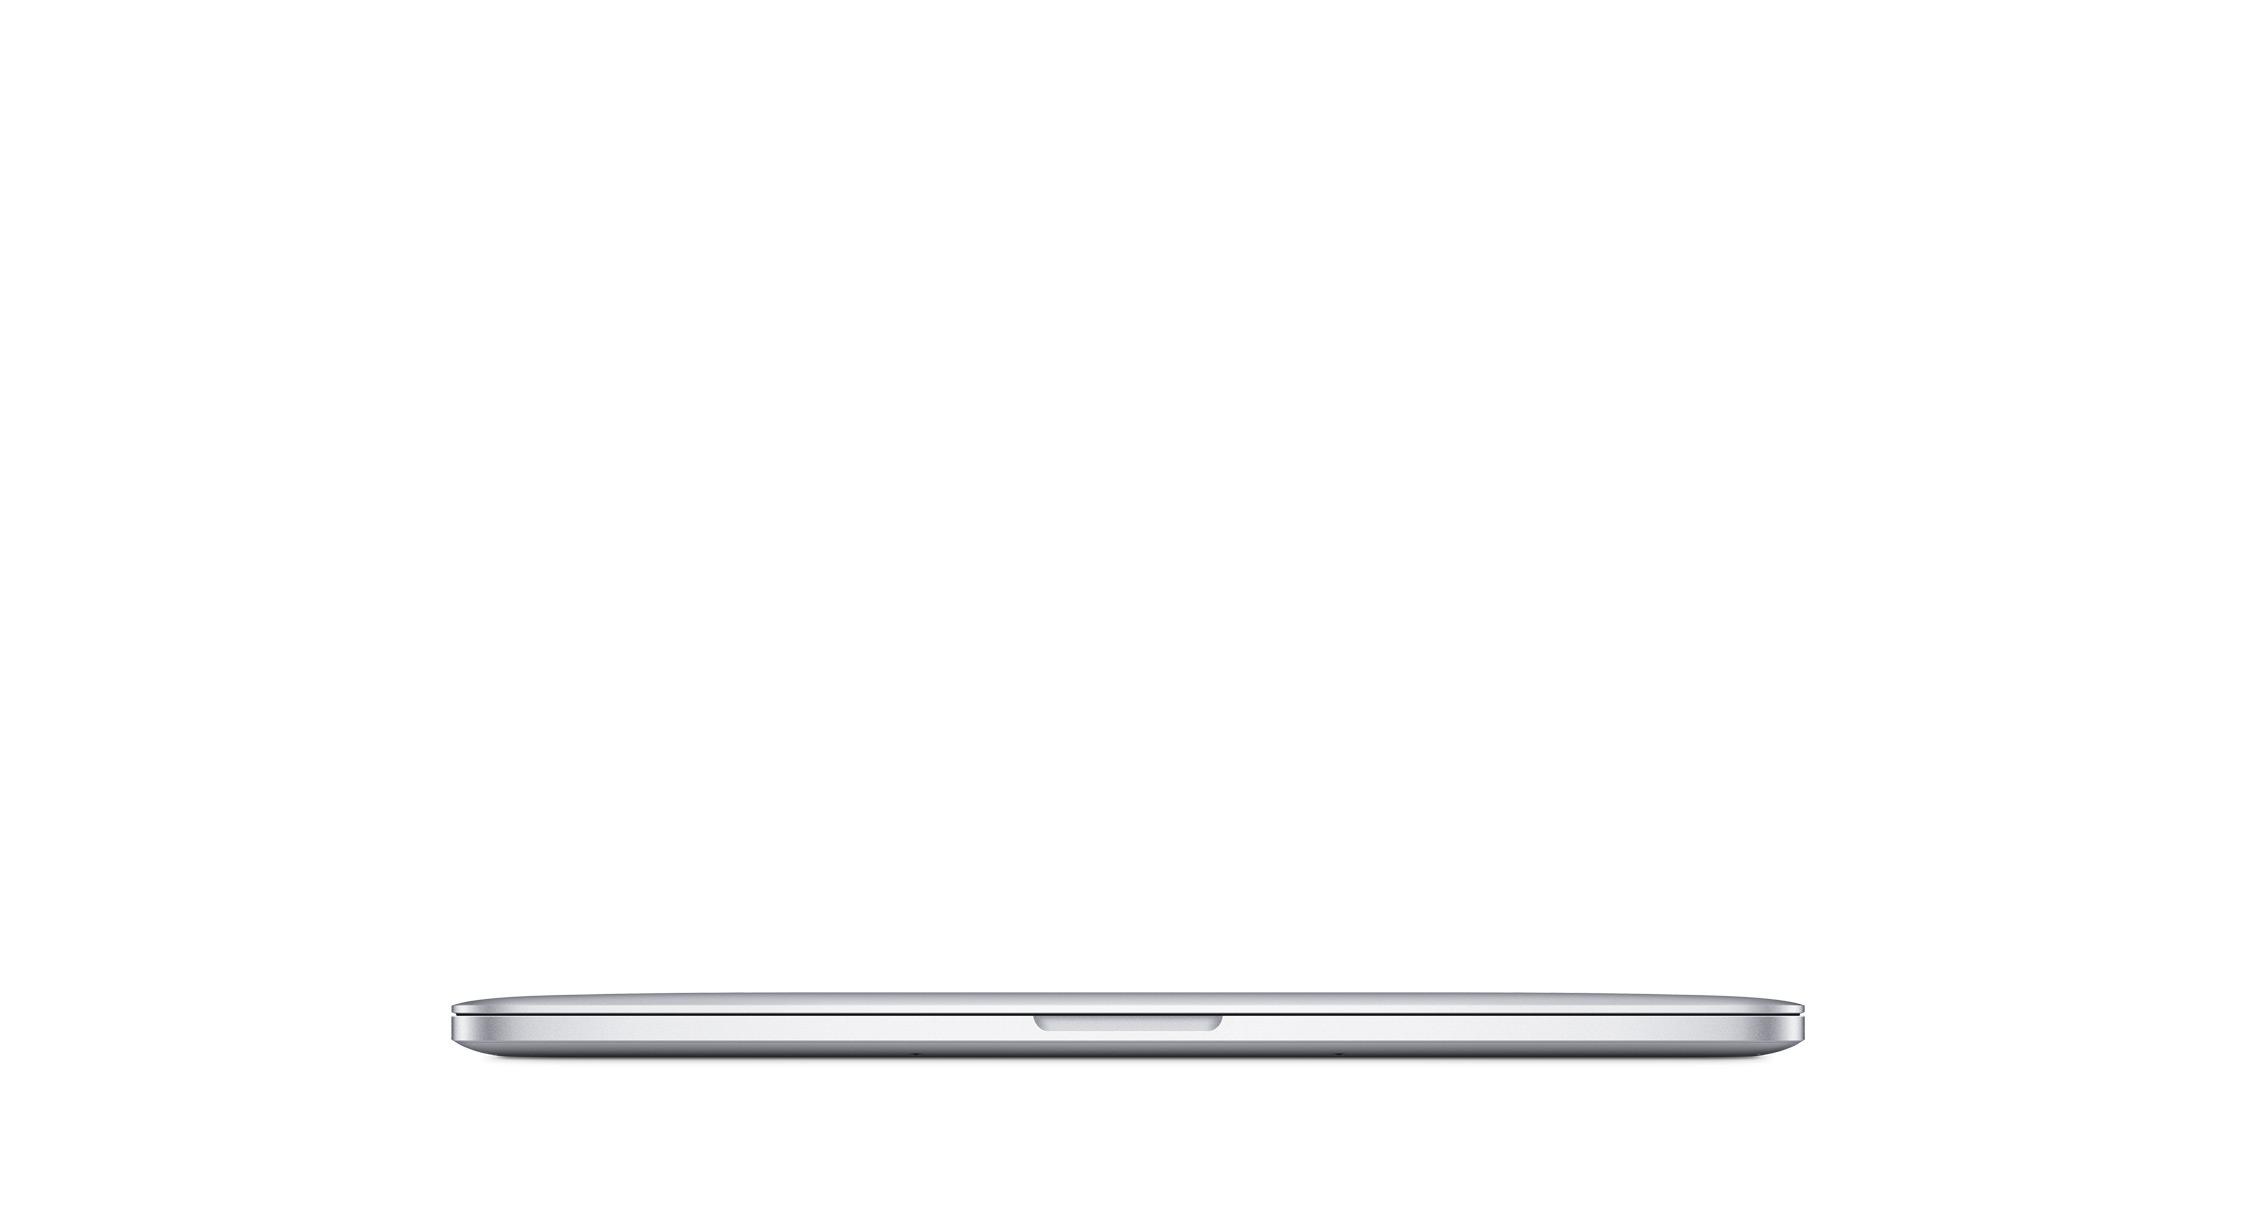 Macbook Pro Retina 15 inch 2015- MJLT2 - I7/ 2.8/ 16/ 512GB Card rời  2GB / 99%